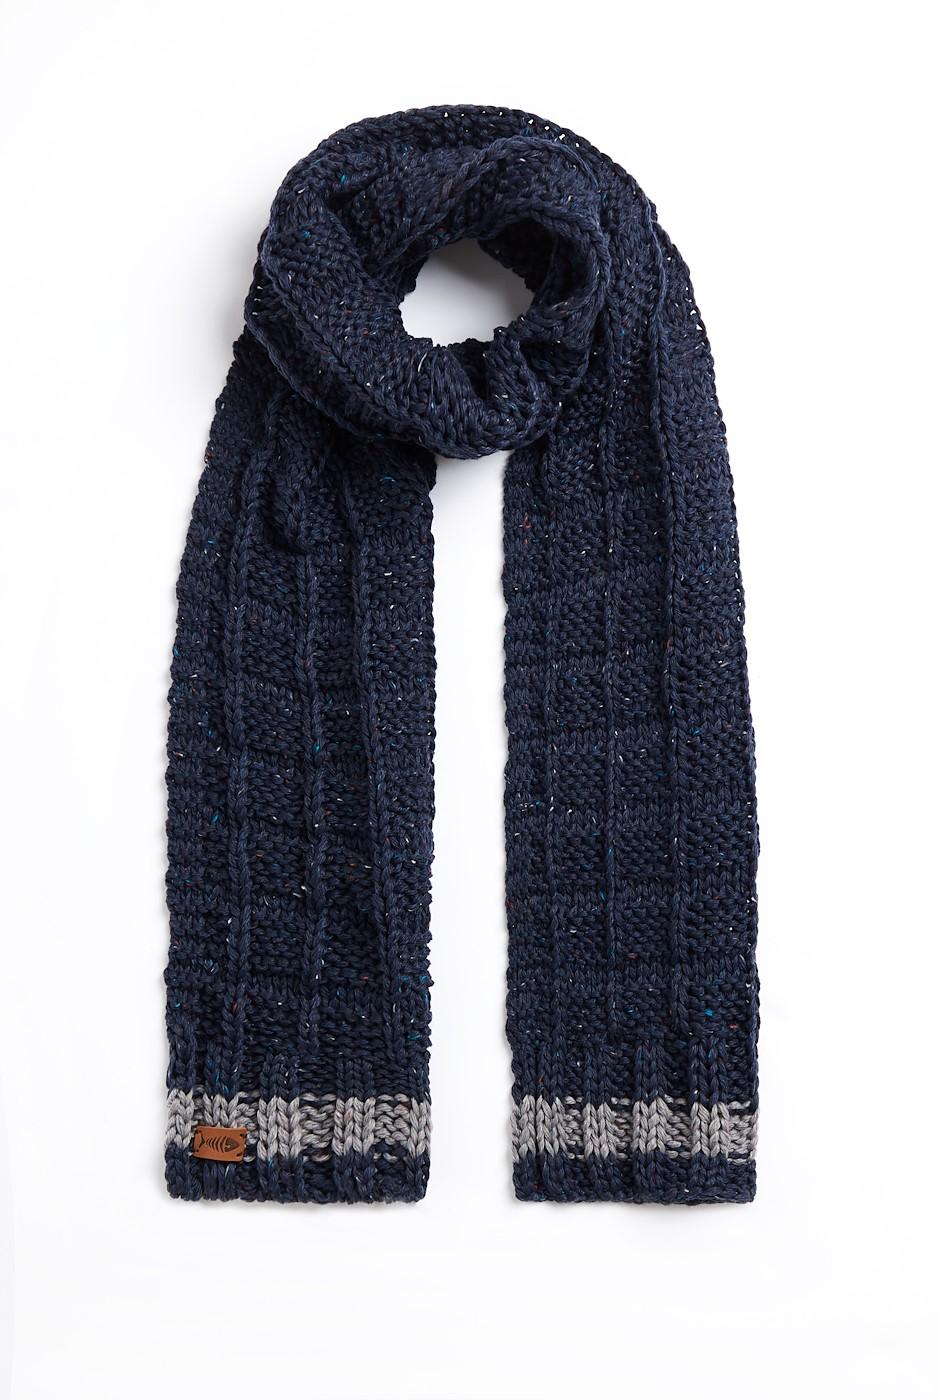 Nishin Eco Nepp Textured Stitch Scarf Navy